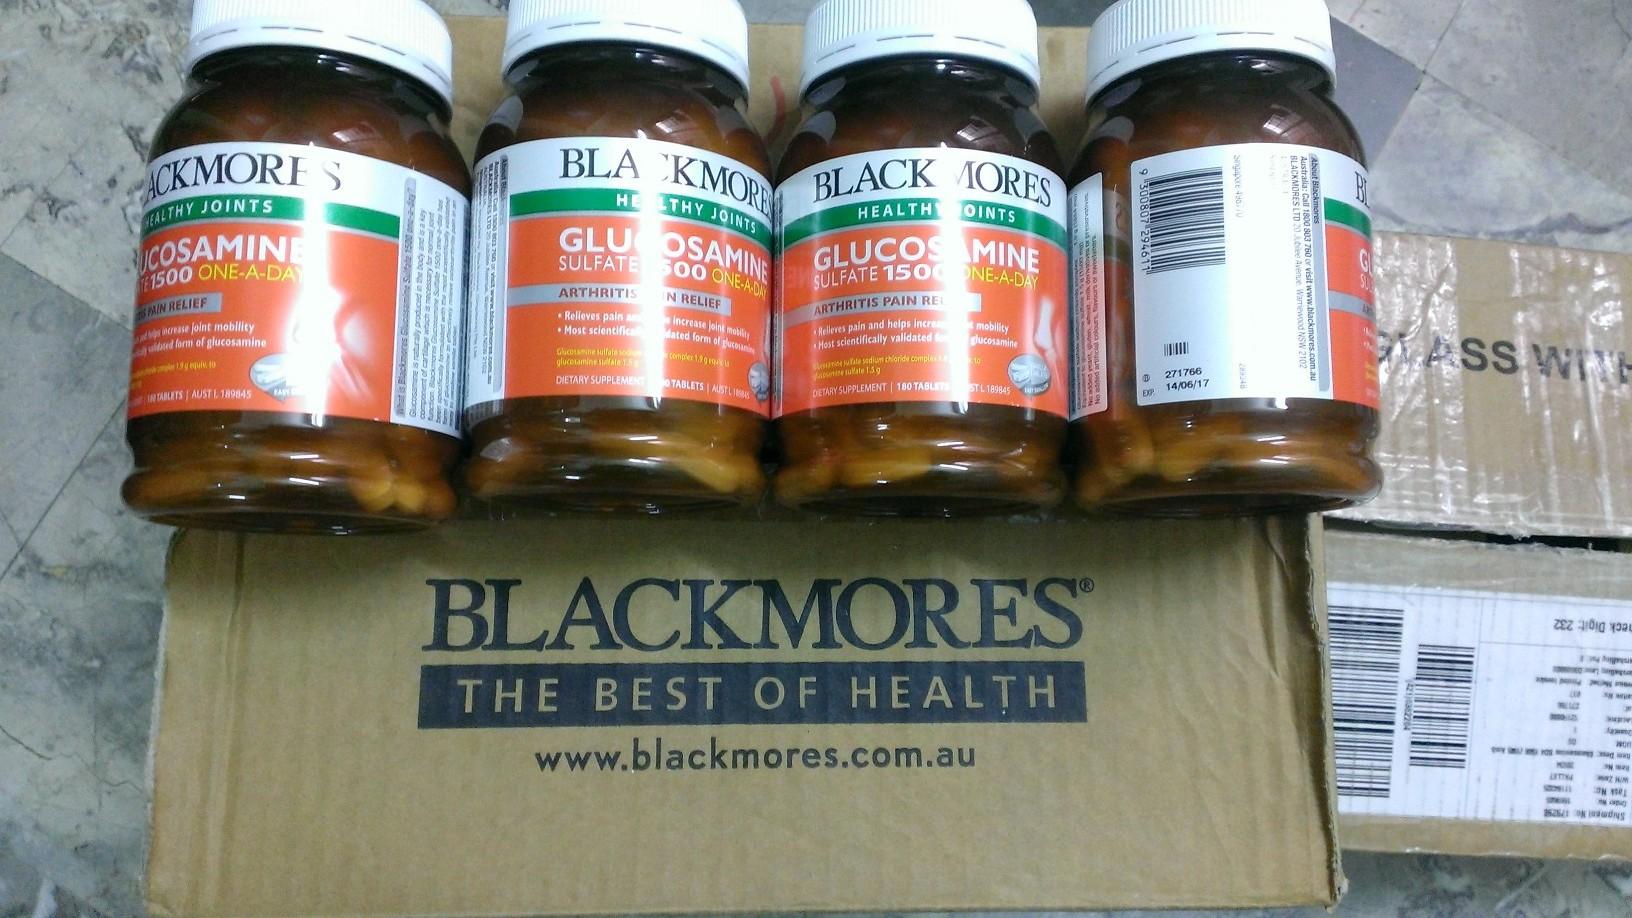 Blackmores-Glucosamine-1500